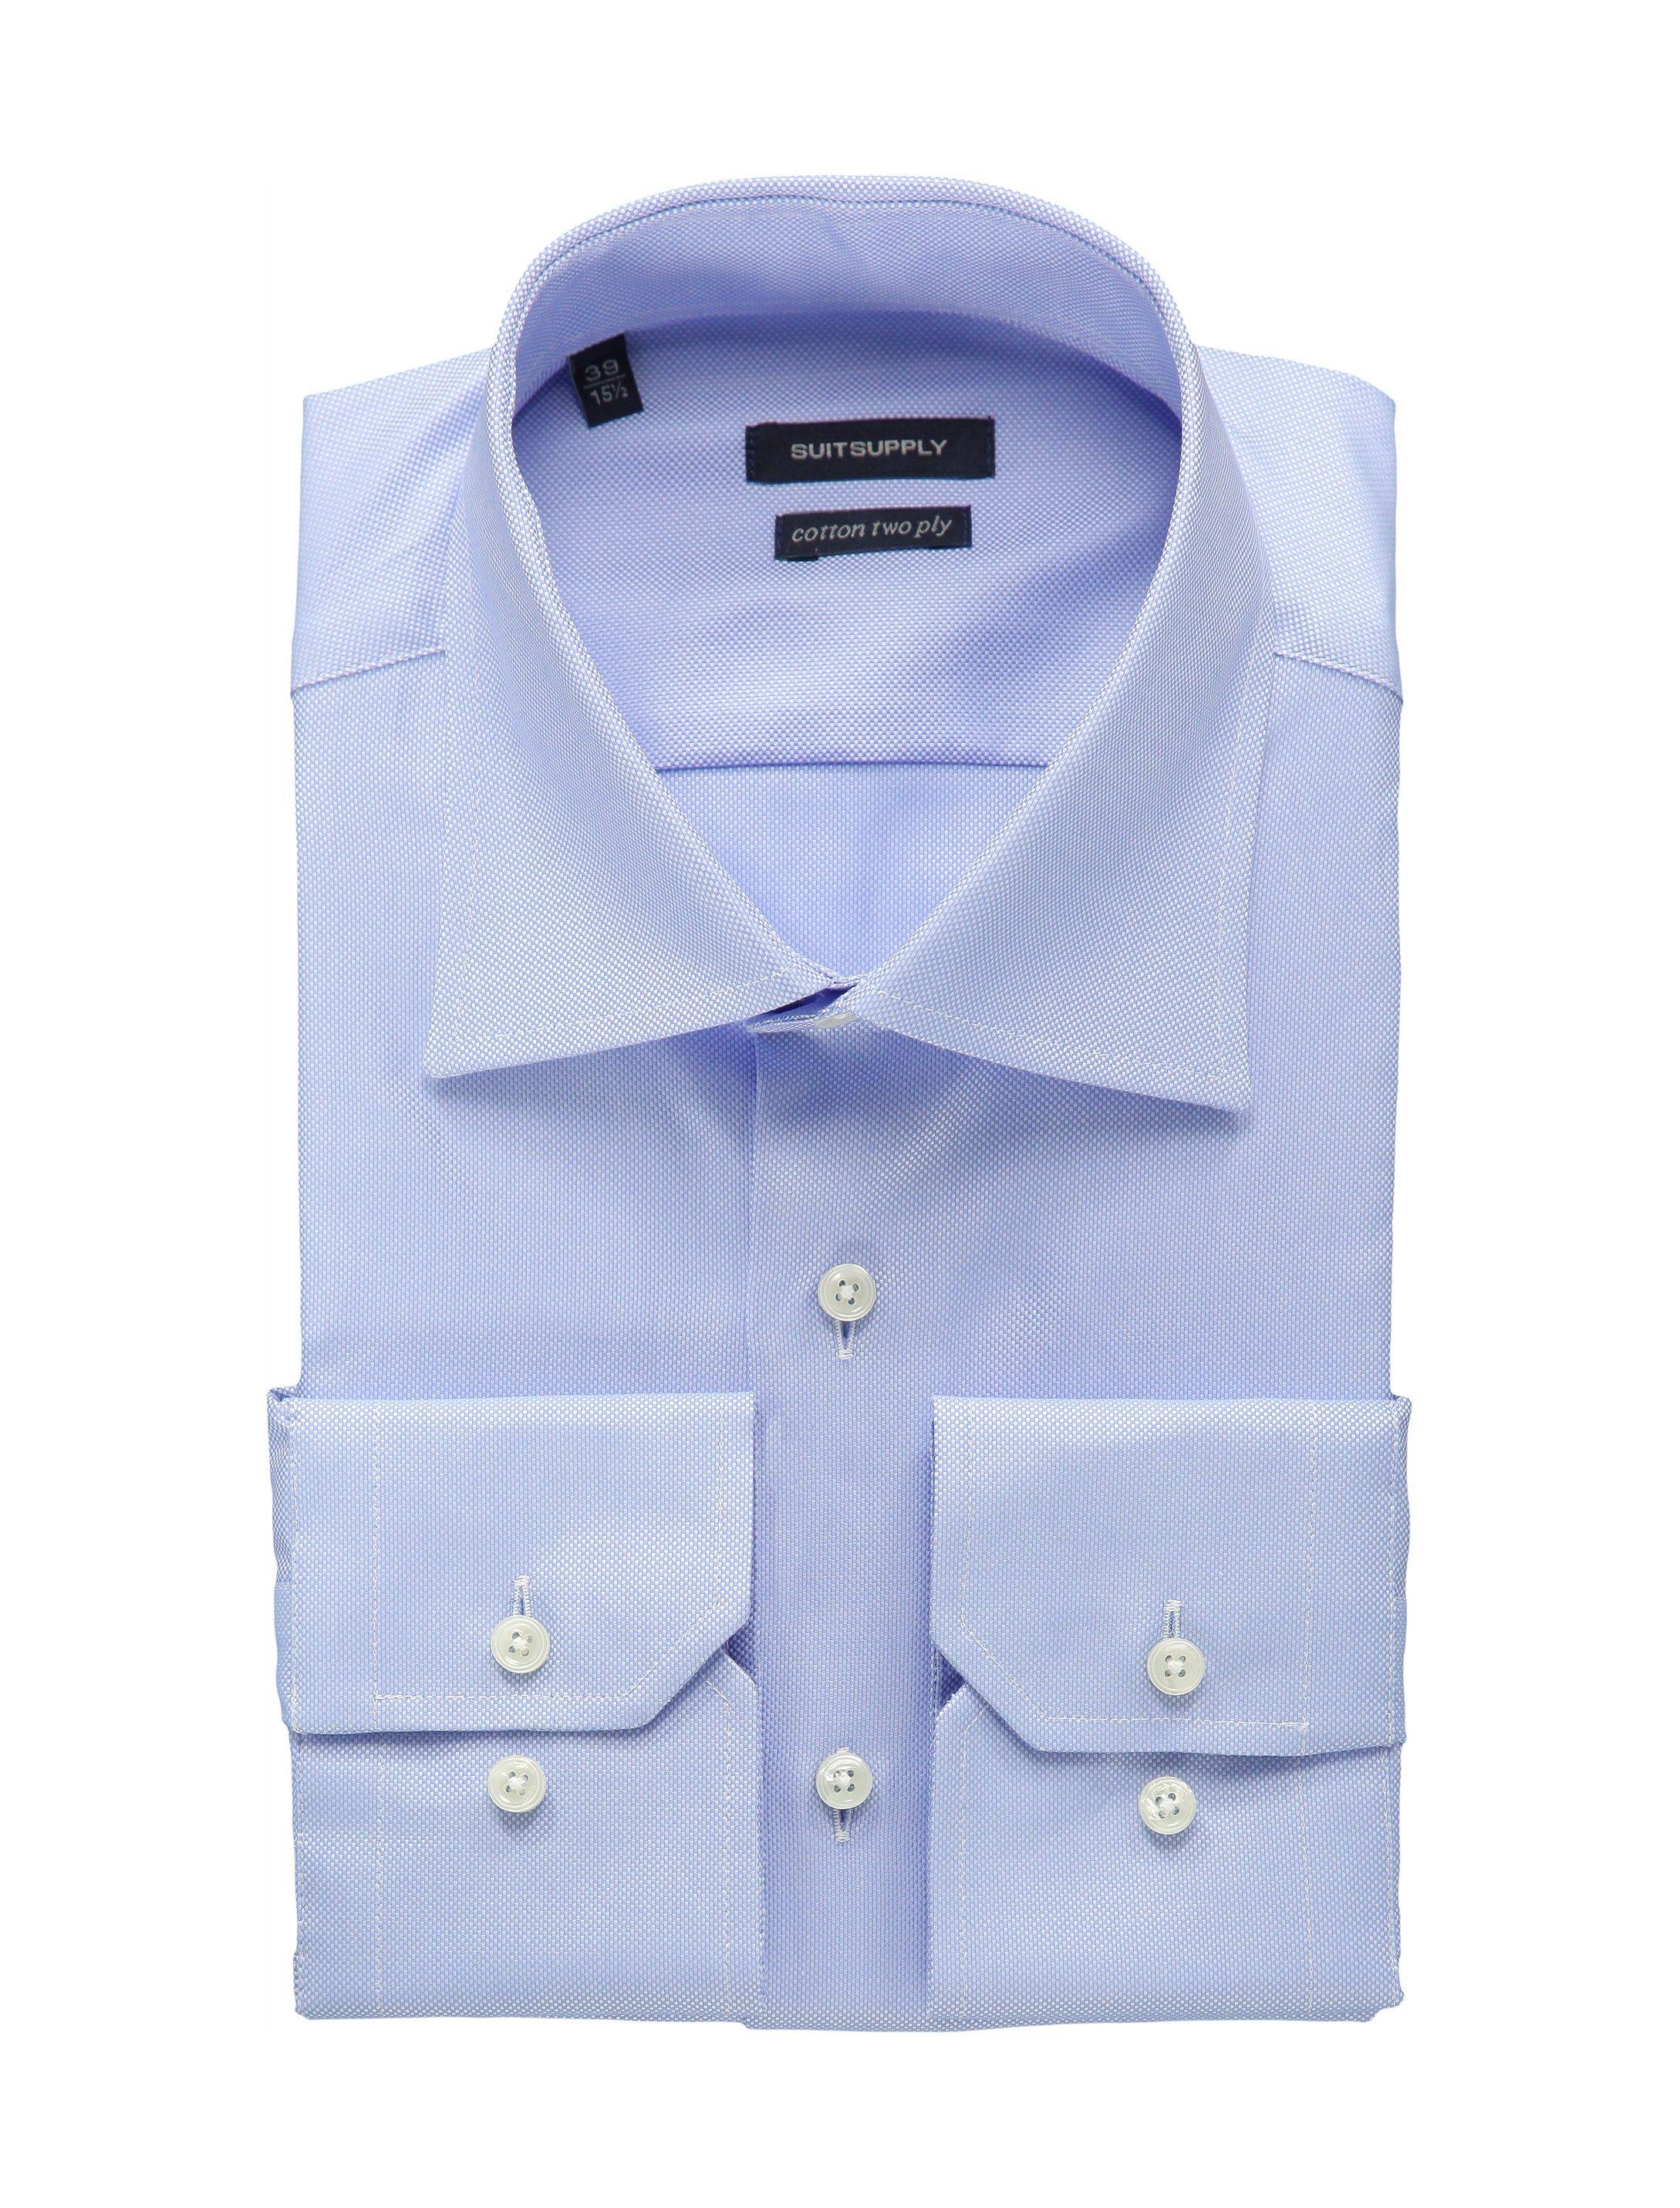 7dd874982c9c Blue Oxford Shirt   Suitsupply   Menswear   Blue oxford shirt ...